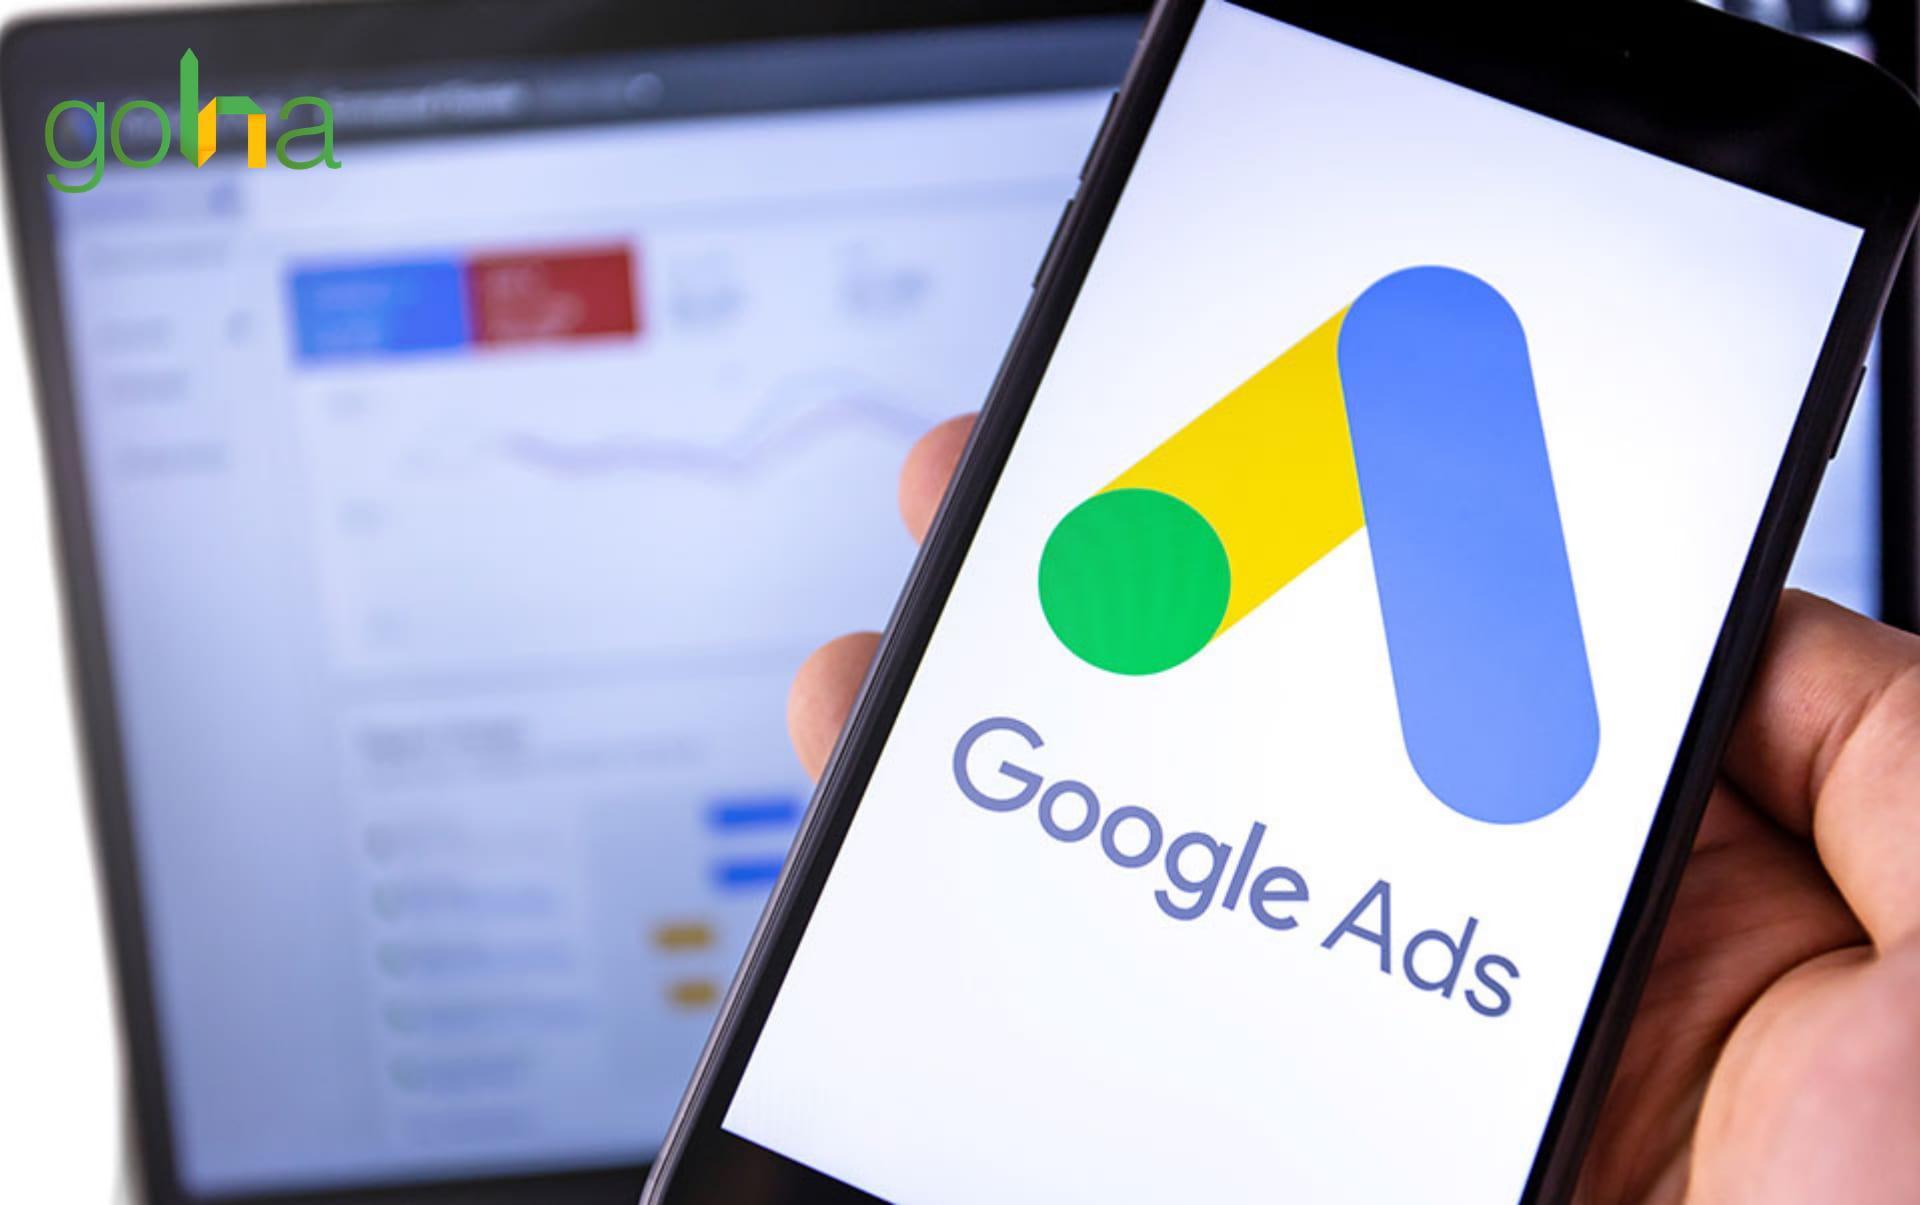 google-ads-phu-hop-de-marketing-cho-doanh-nghiep-tap-trung-mo-rong-mang-b2b